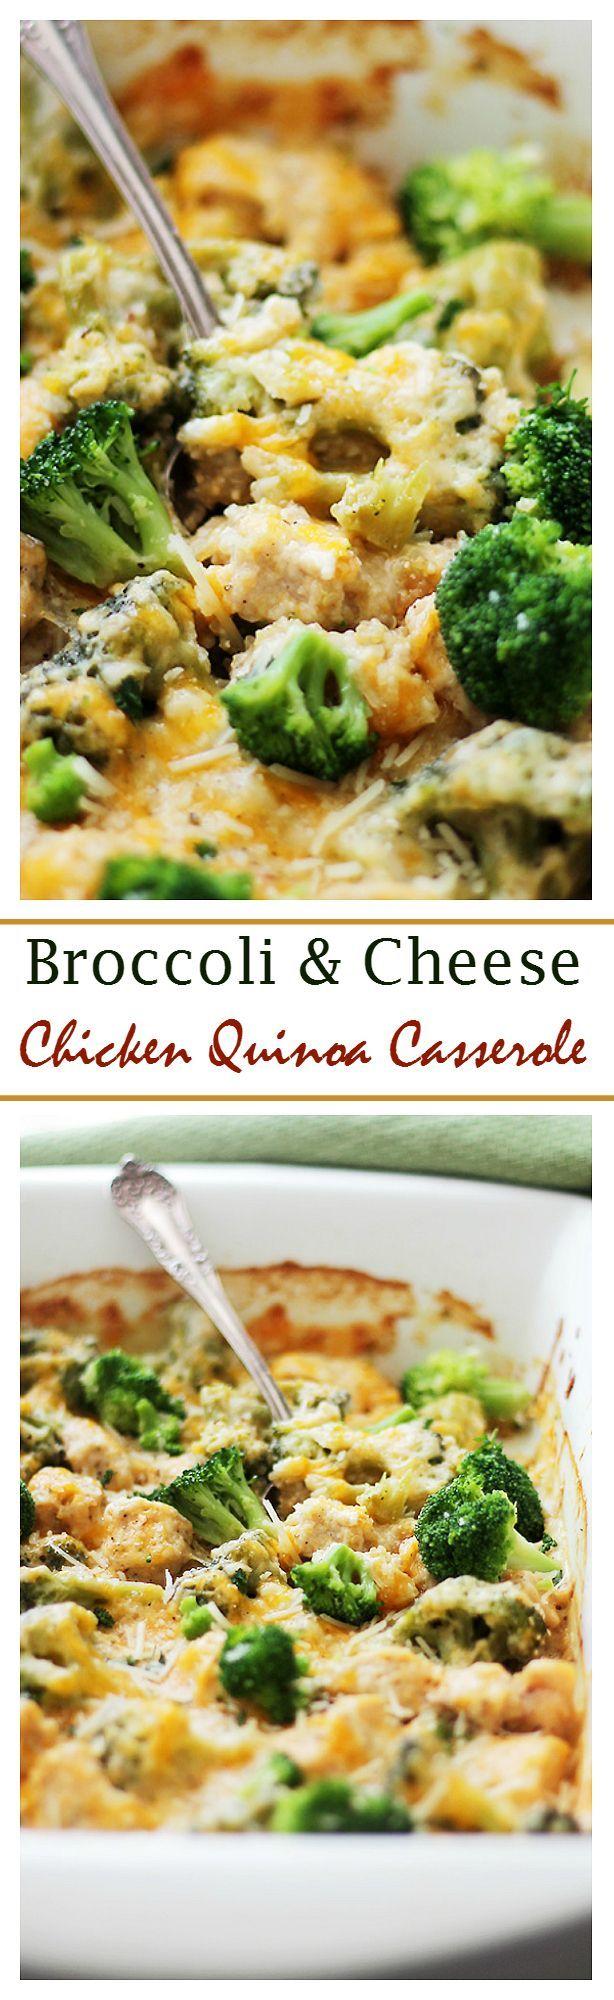 Broccoli and Cheese Chicken Quinoa Casserole | www.diethood.com |  Light and creamy casserole filled with broccoli, chicken, quinoa and cheese! This will rock your taste buds!